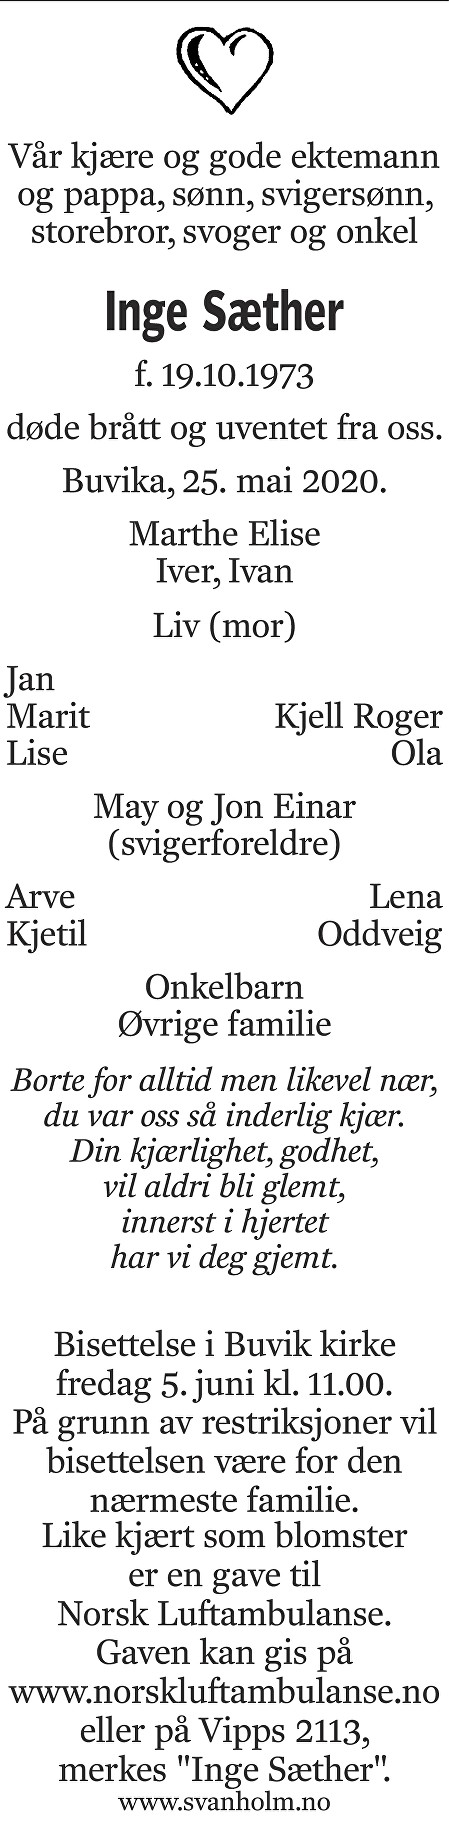 Inge Sæther Dødsannonse